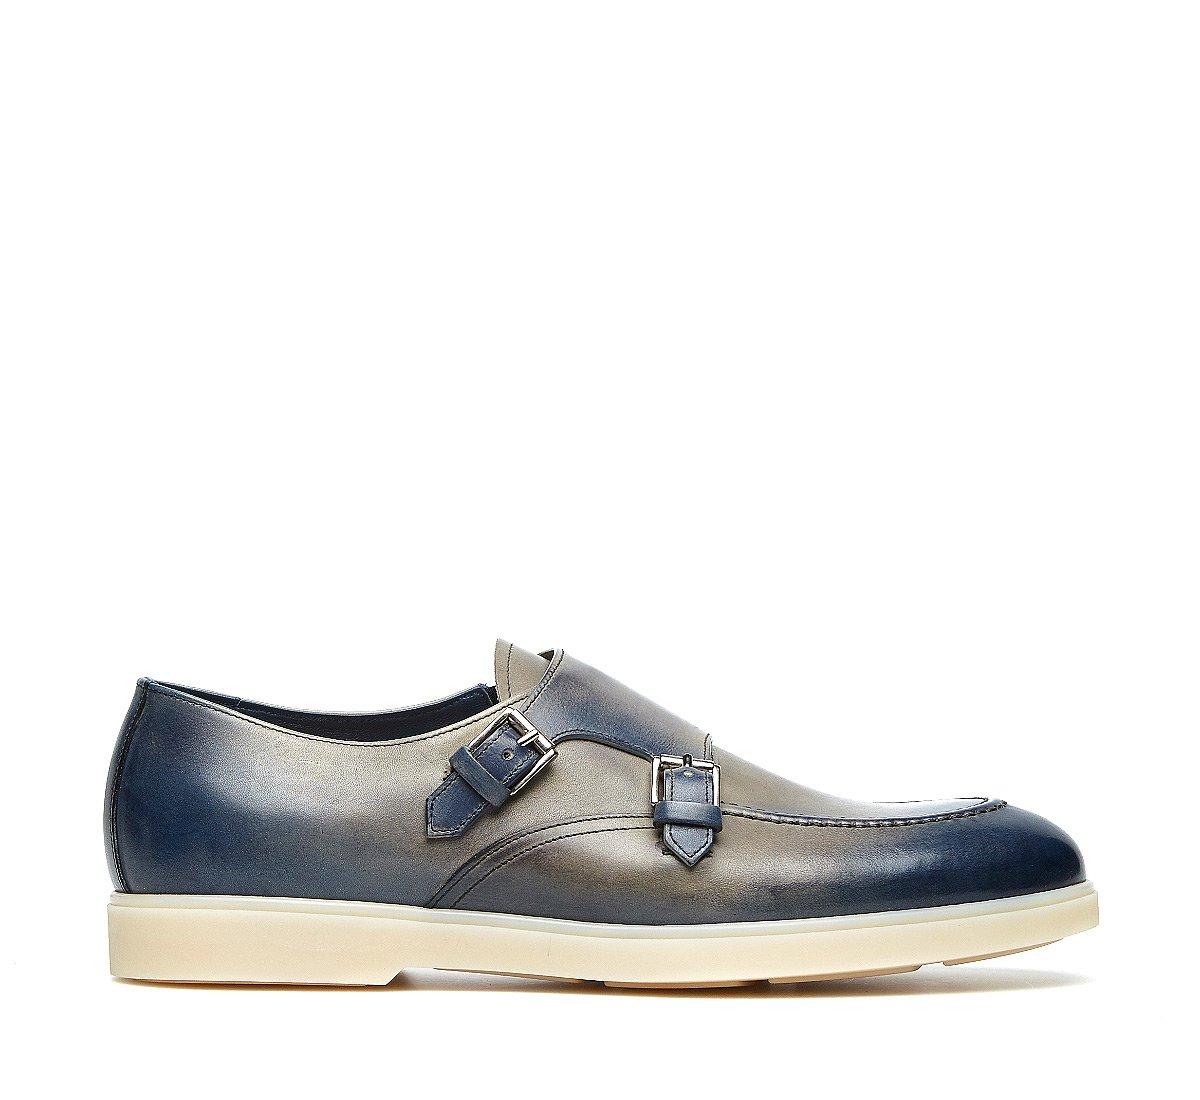 Fabi Flex double monk-strap shoes in exquisite calfskin